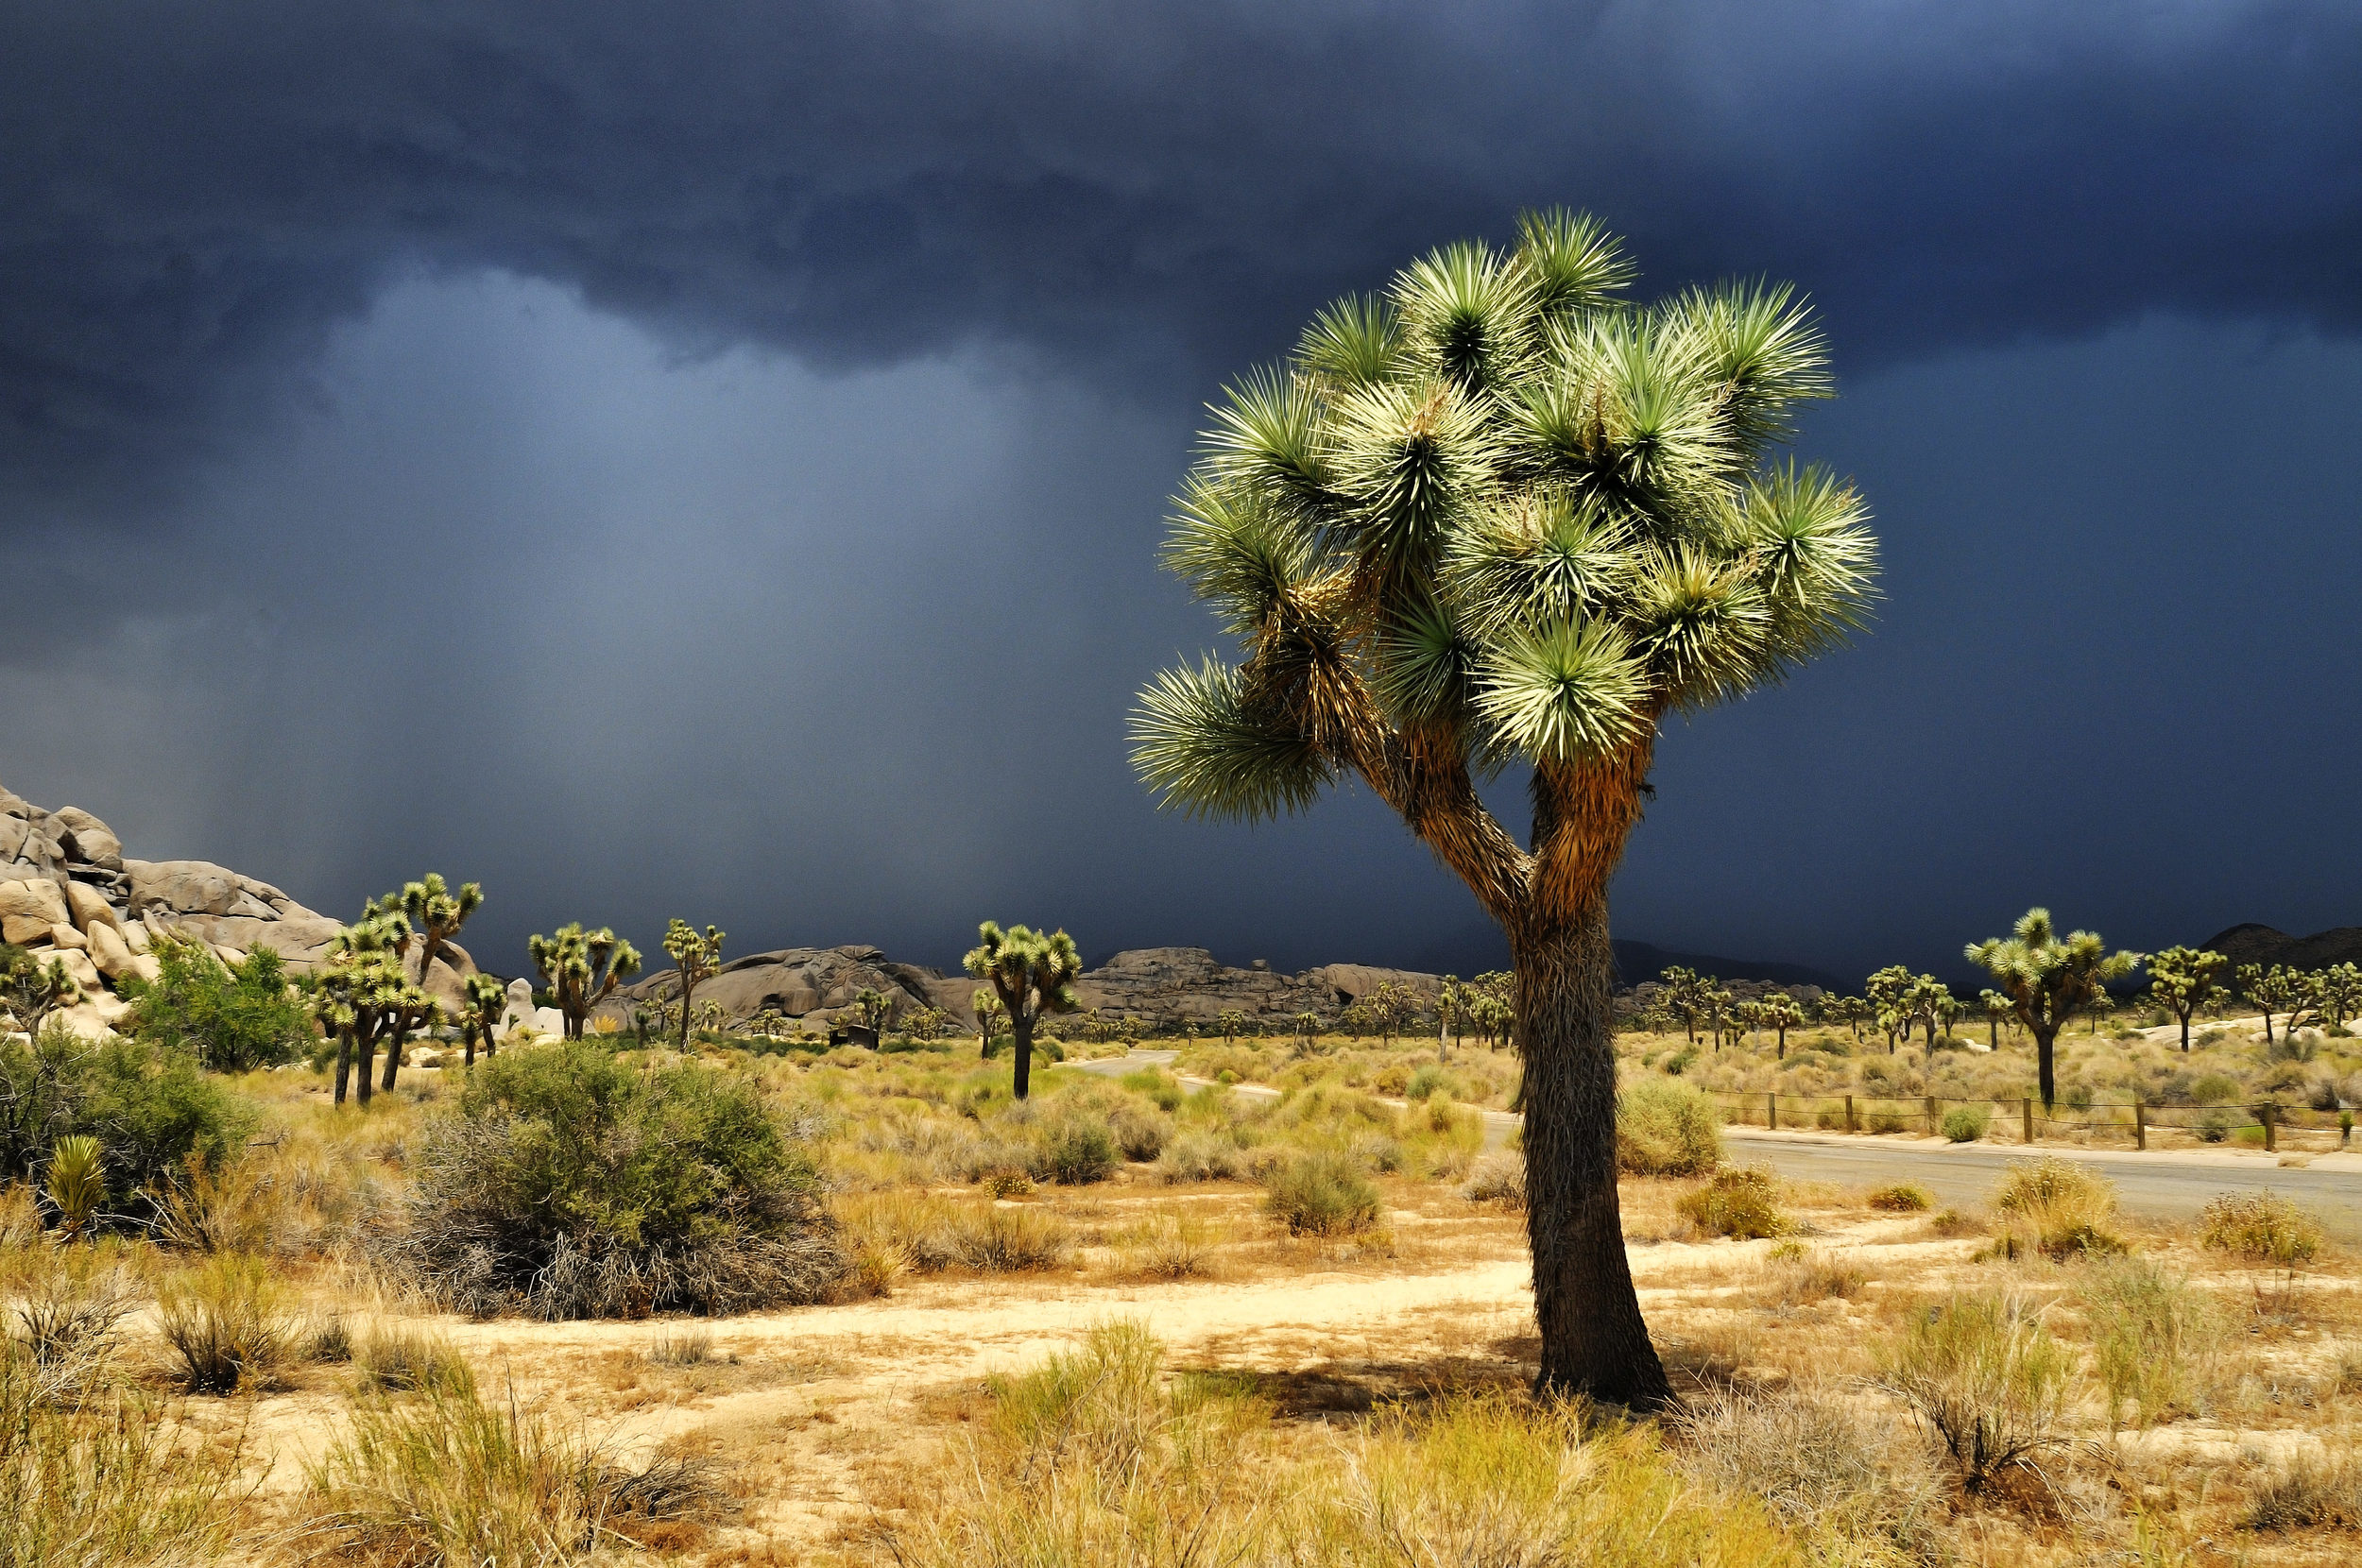 A Storm Passes Through (Photo: Martin Froyda/Shutterstock)